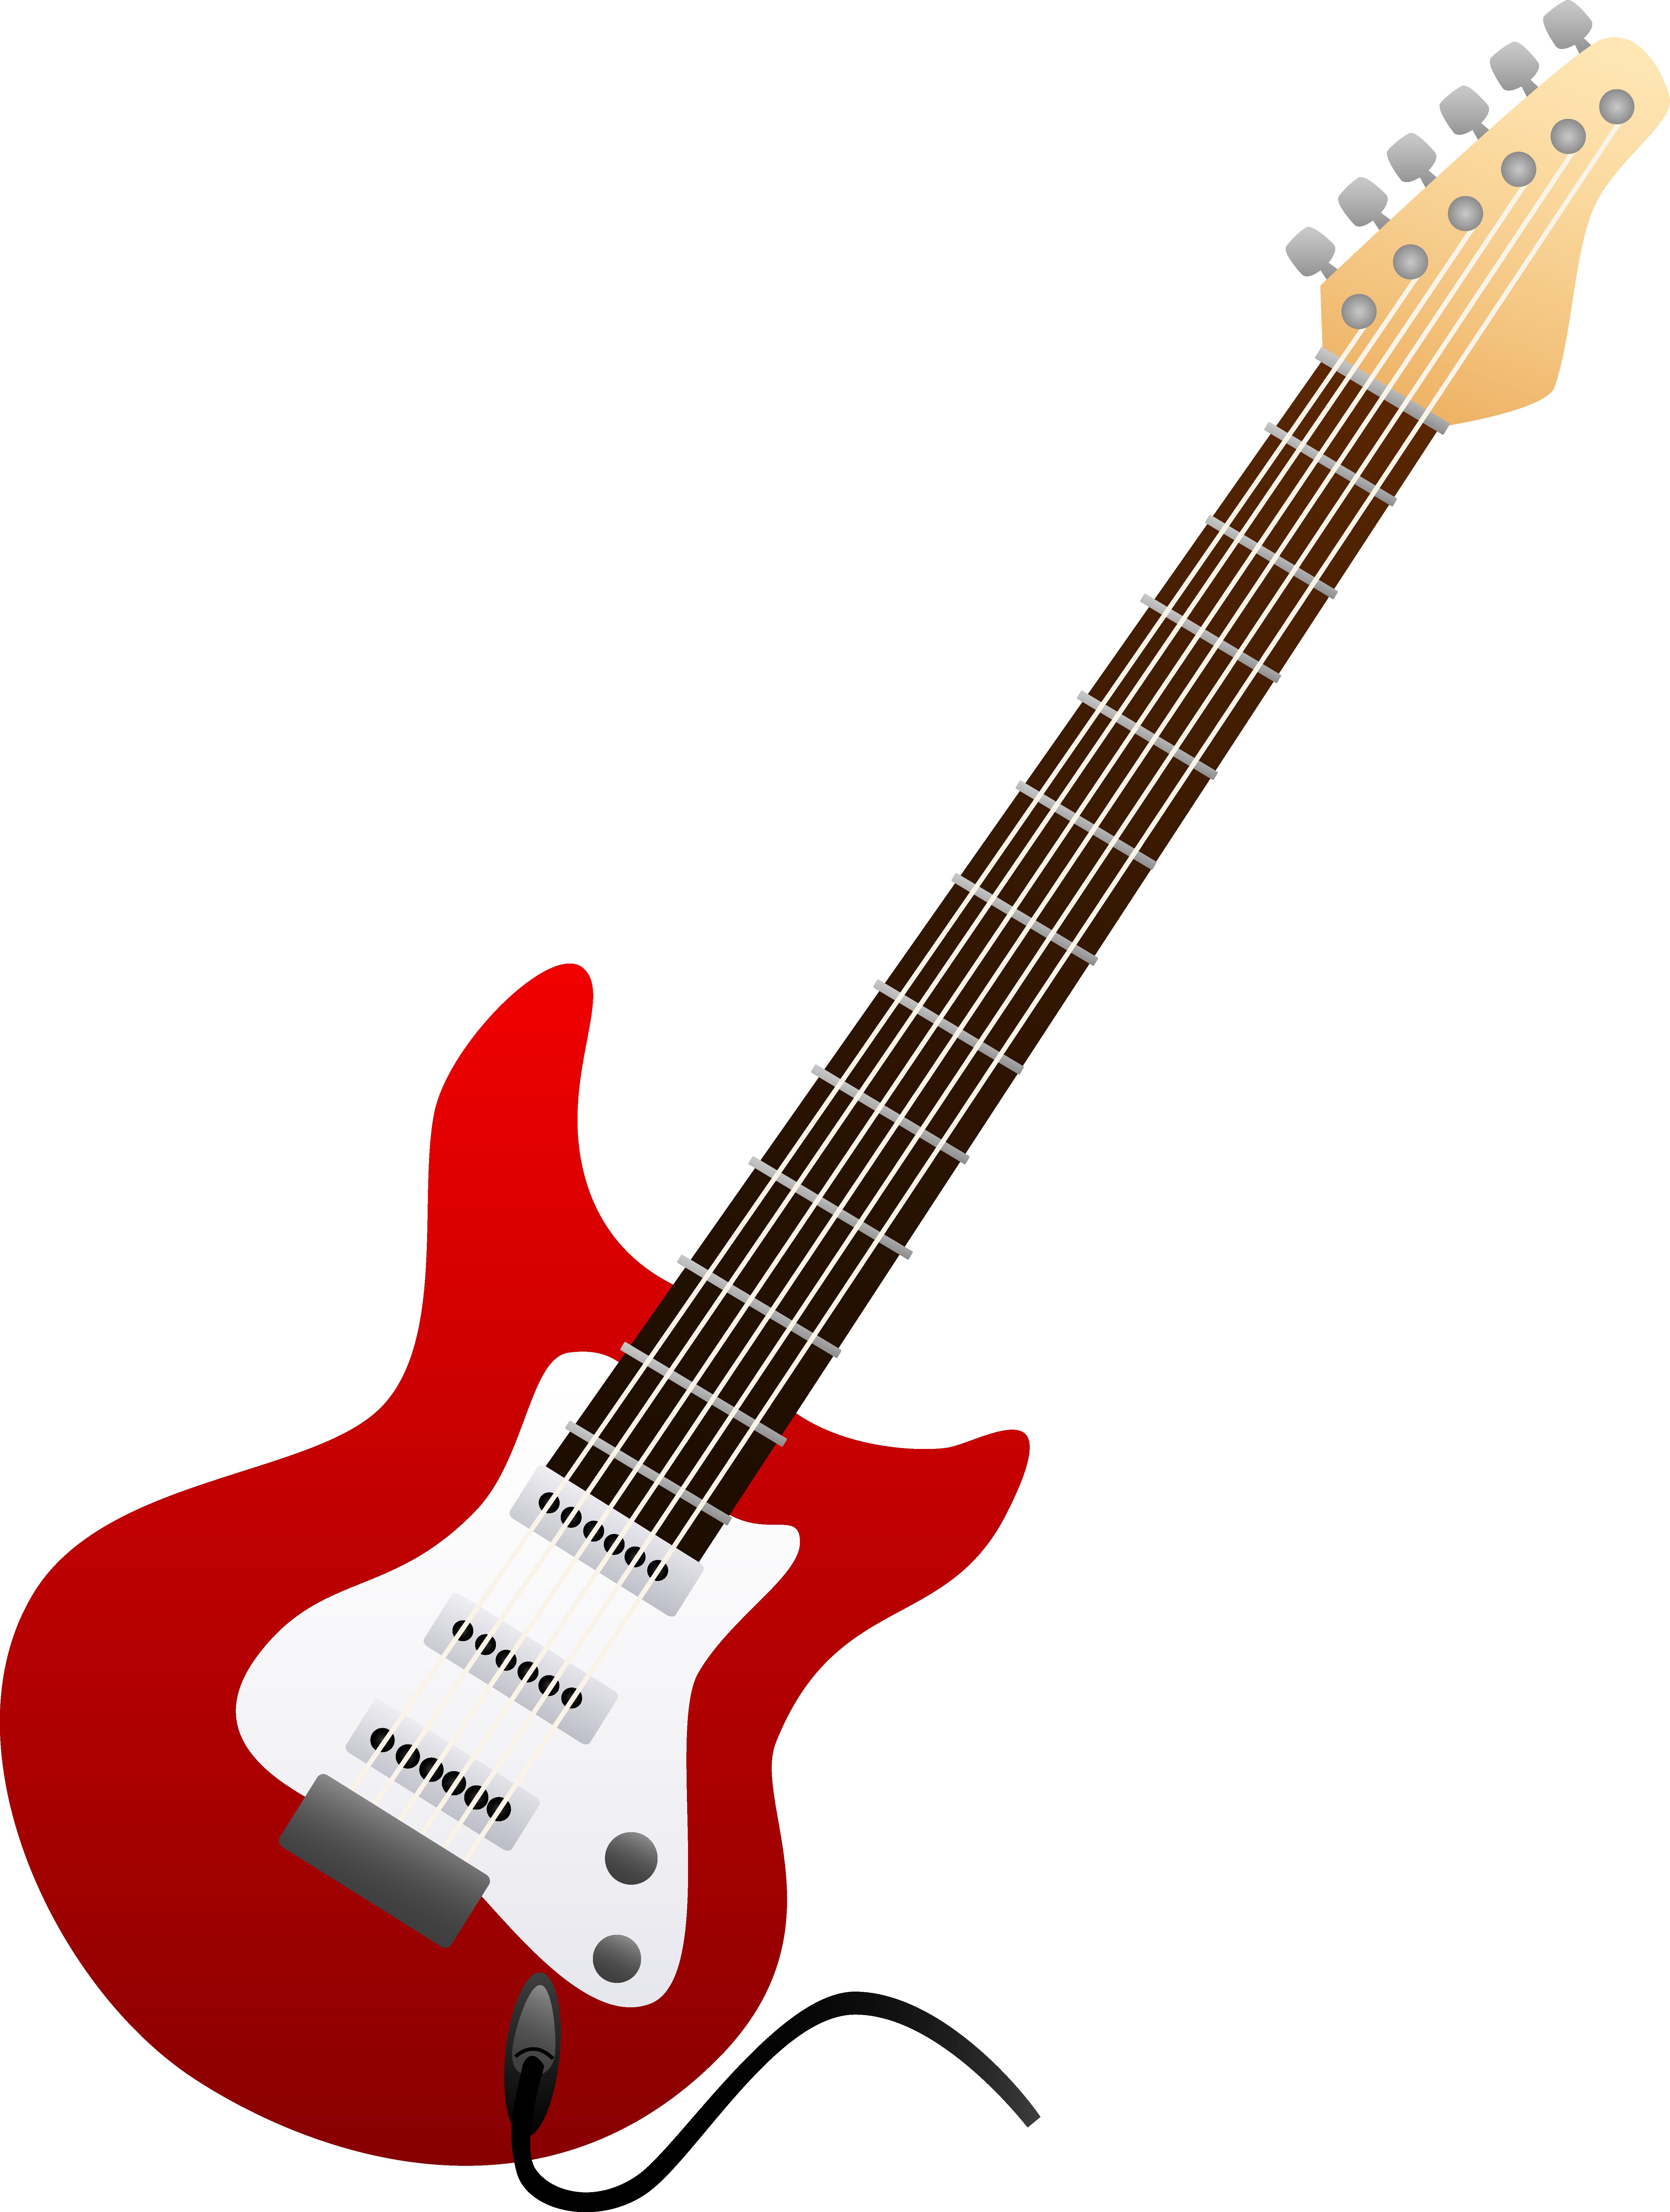 Rock guitar clipart free